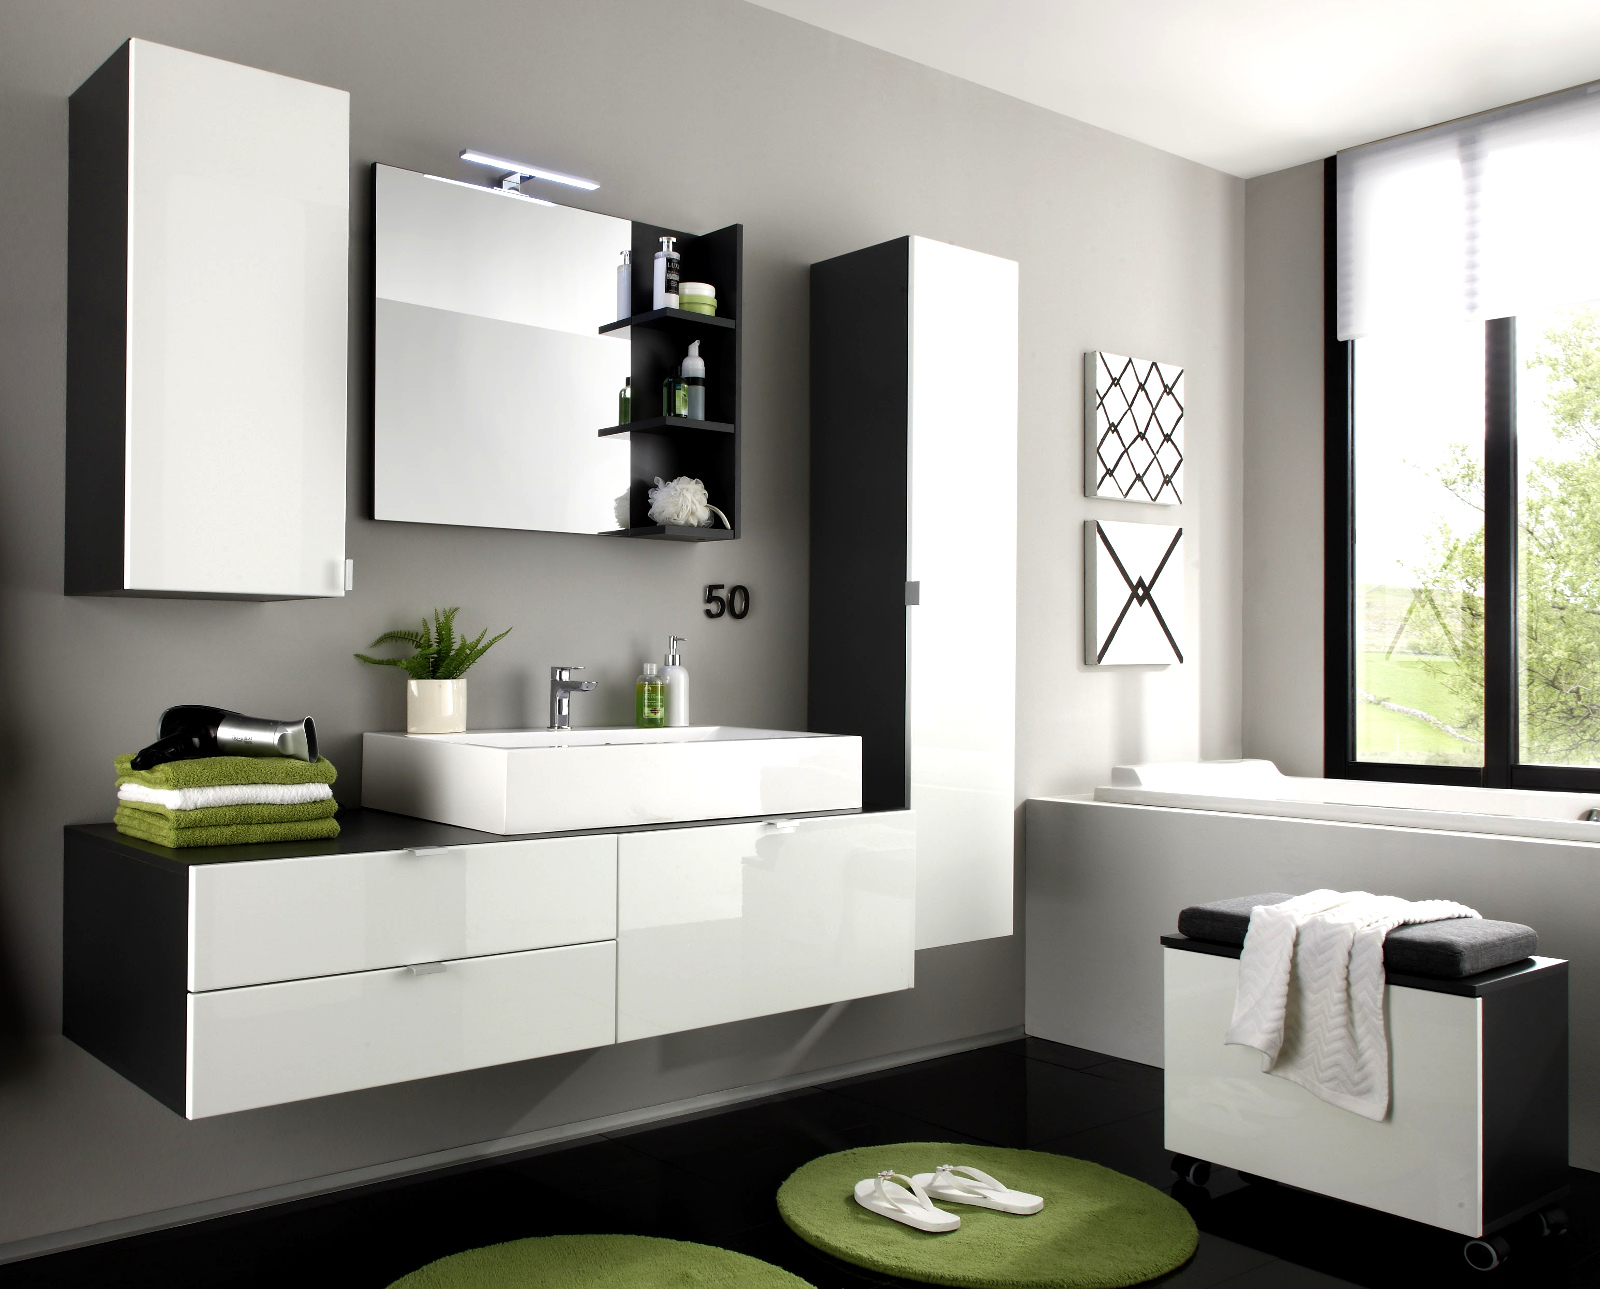 badezimmer badm bel set beach 3 teilig wei hochglanz. Black Bedroom Furniture Sets. Home Design Ideas